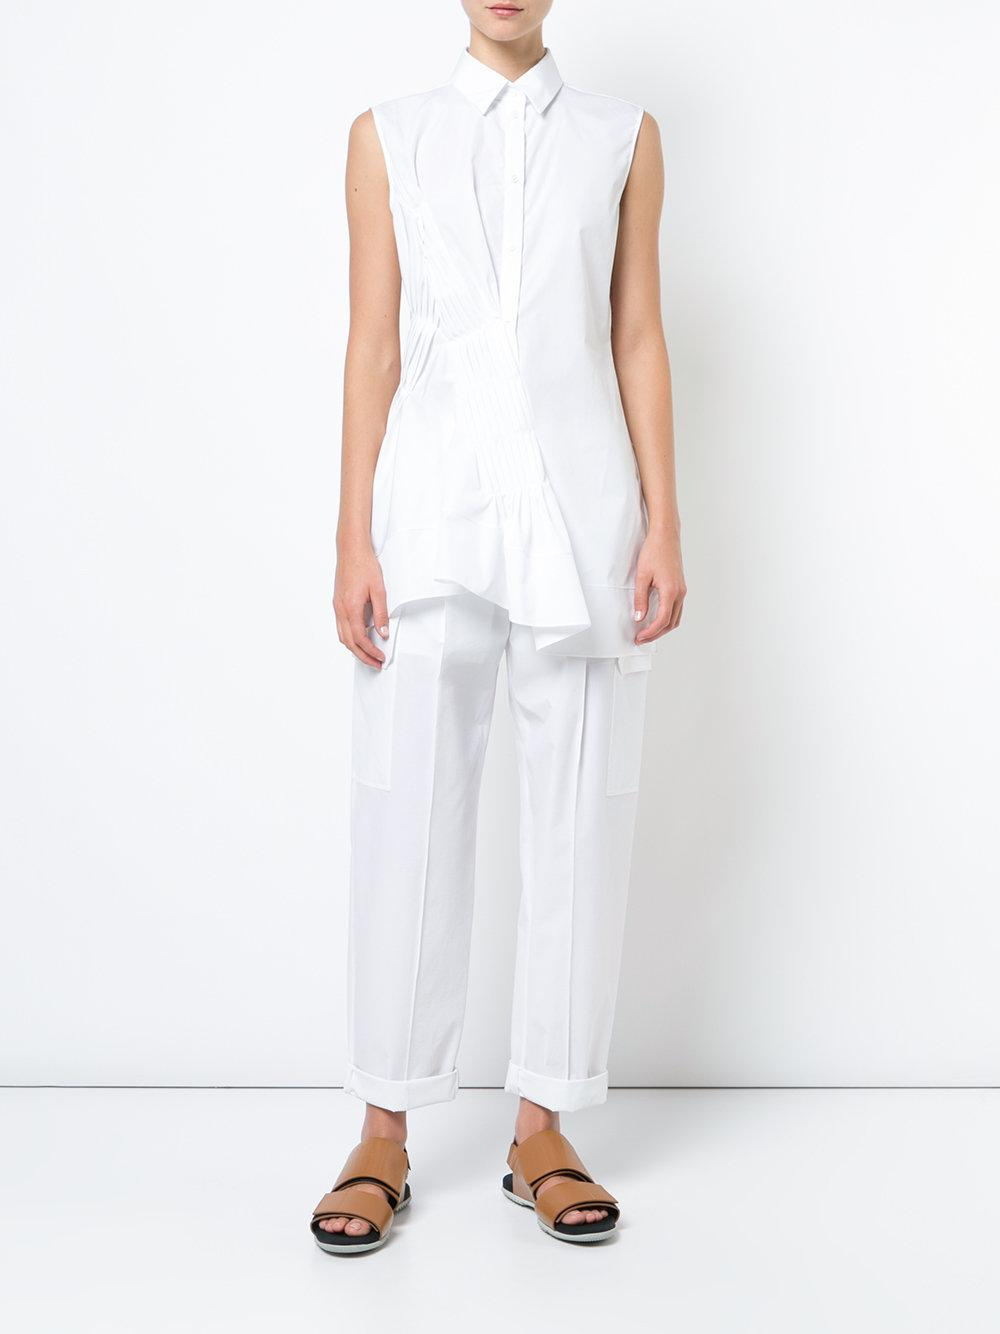 2d9a1da5 Jil Sander - White Pleat Gather Front Shirt - Lyst. View fullscreen